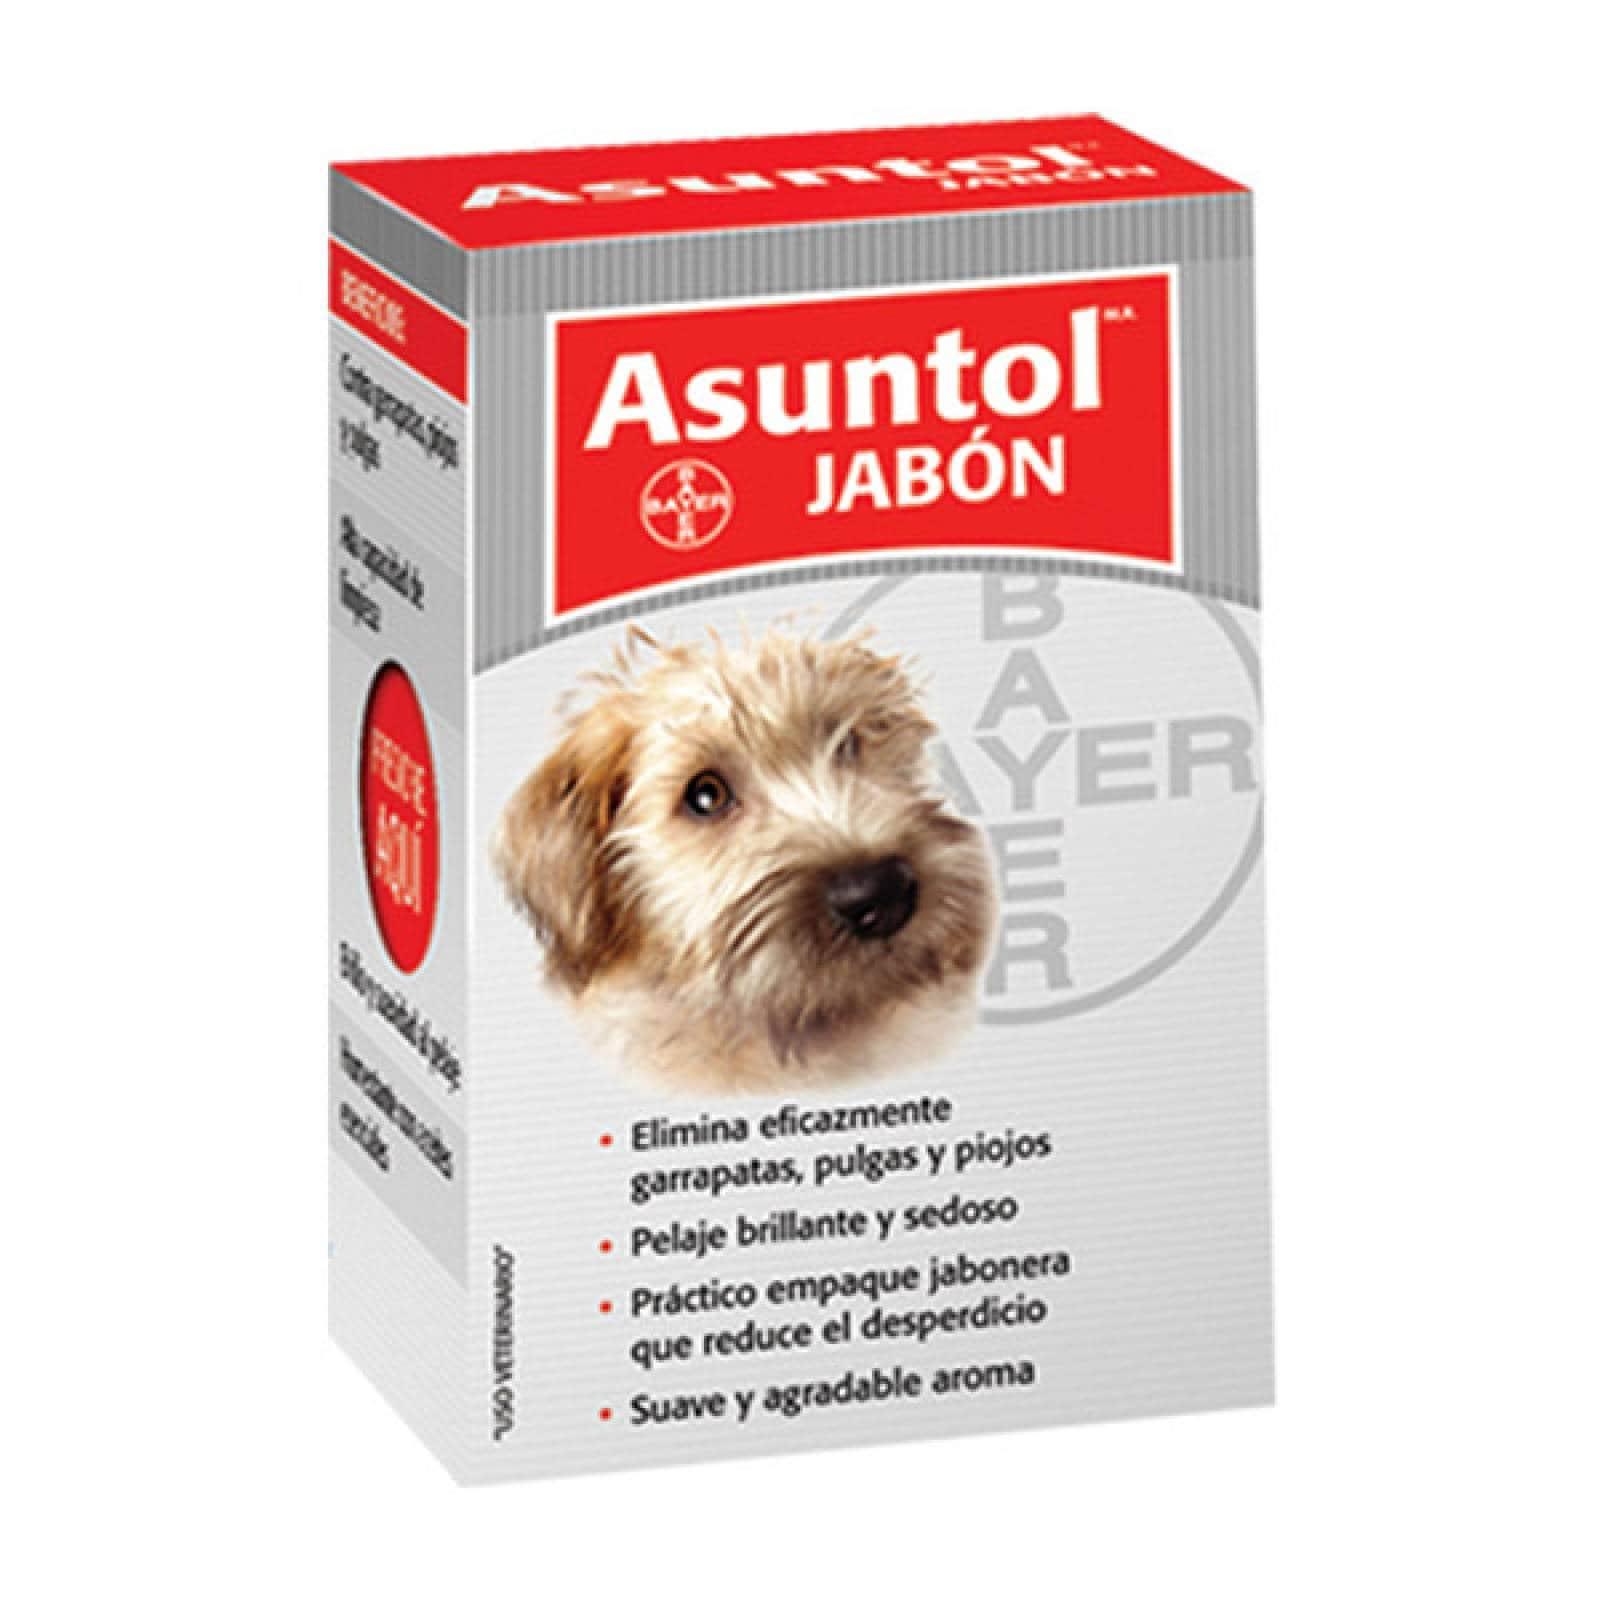 ASUNTOL Jabón Antipulgas para Perro barra de 100gr